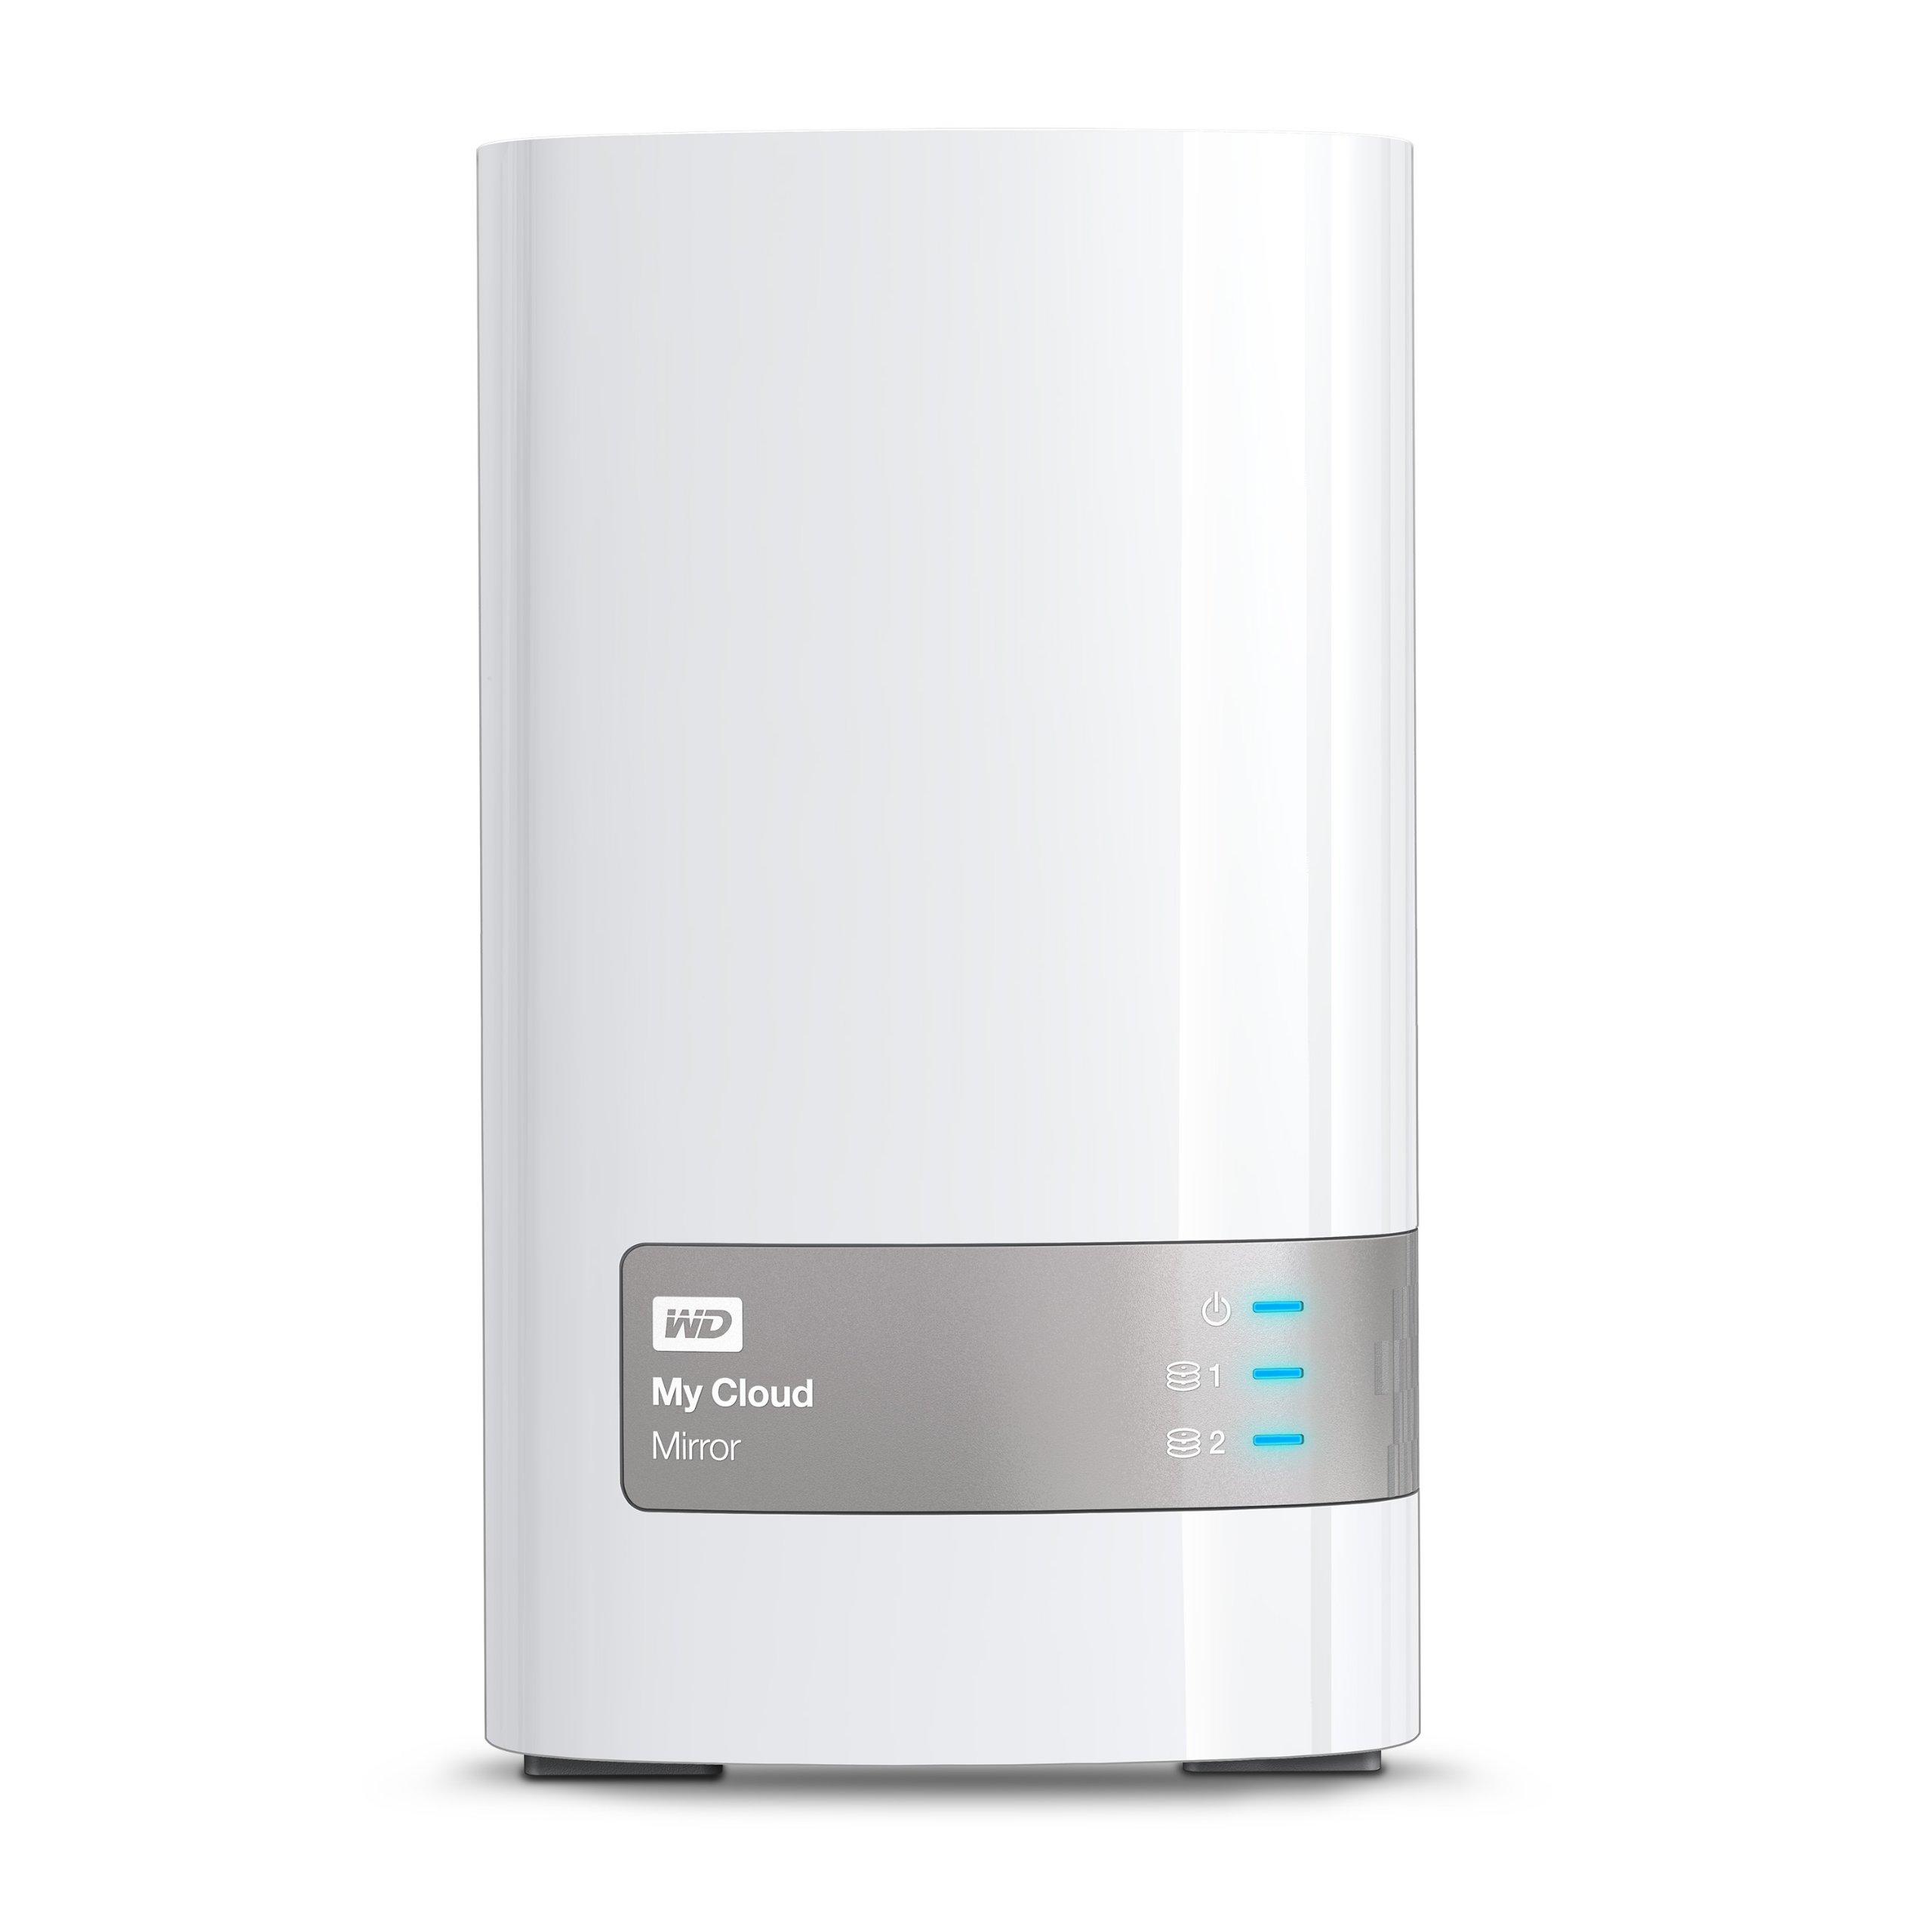 WD 16TB My Cloud Mirror Personal Network Attached Storage - NAS - WDBWVZ0160JWT-NESN